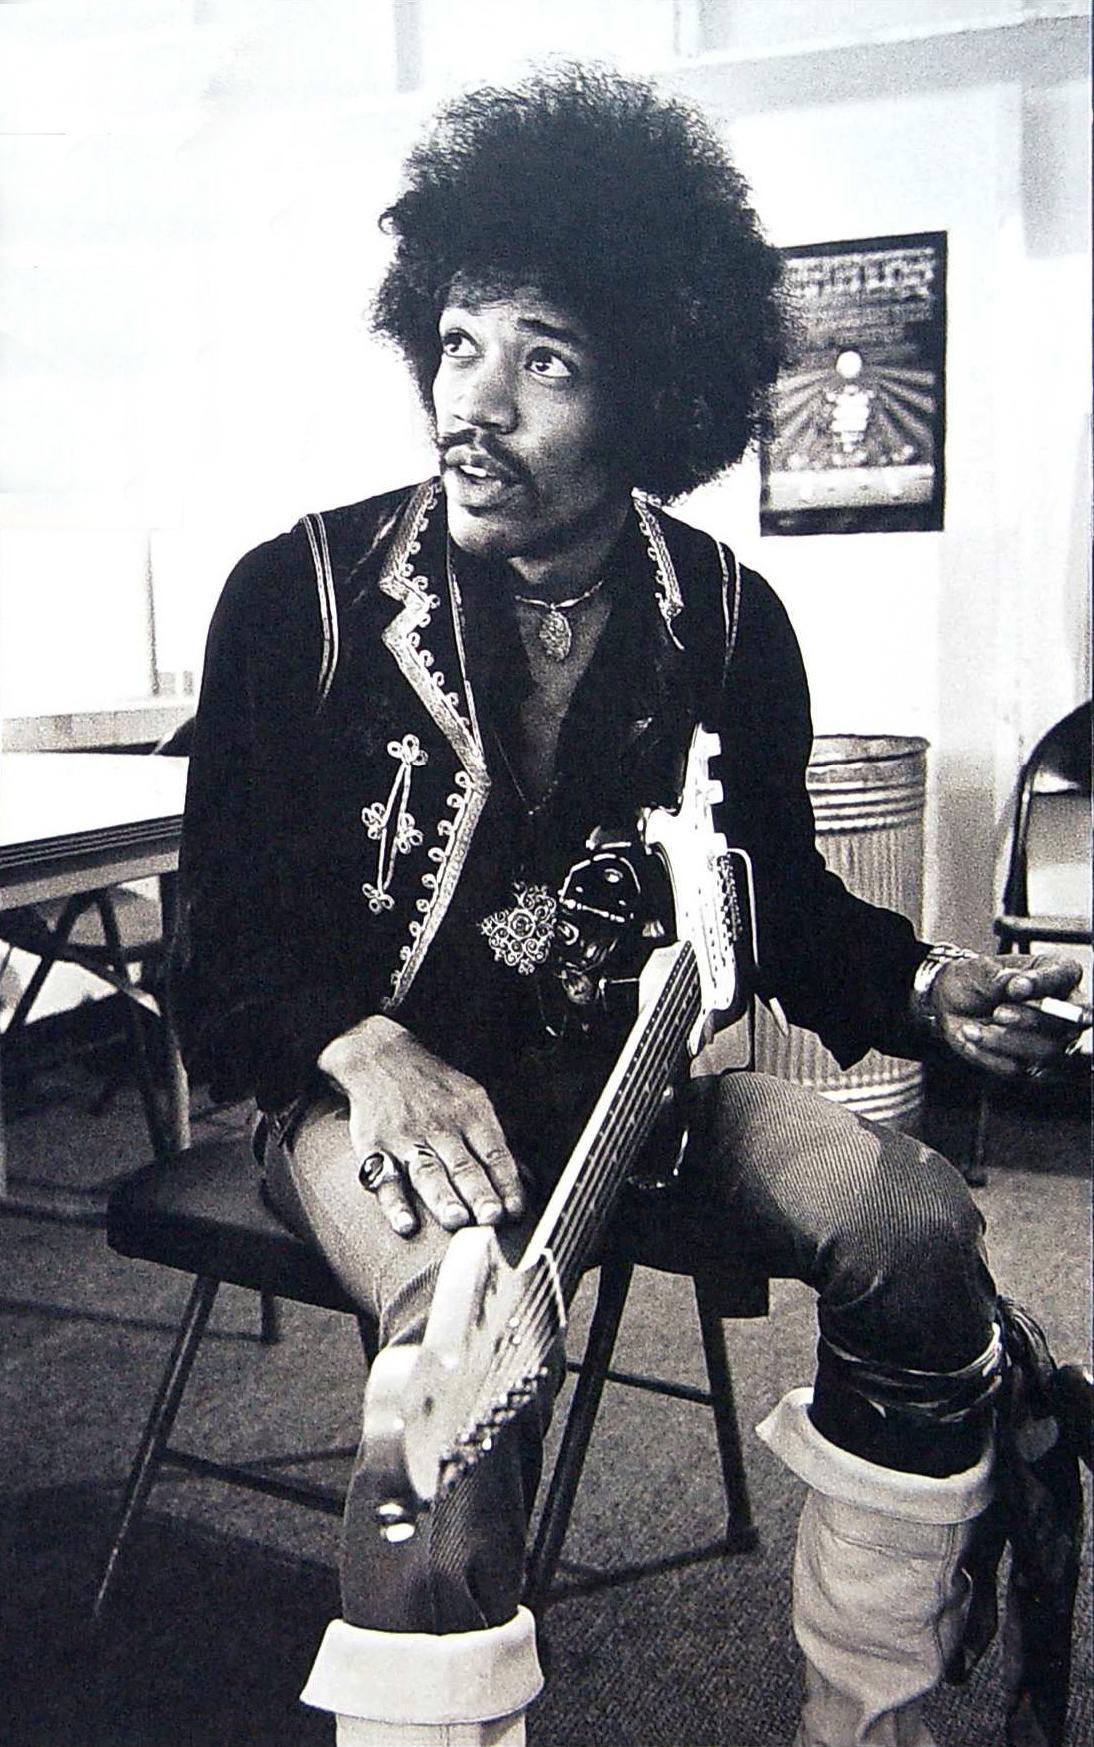 San Francisco (Winterland) : 11 octobre 1968 [Premier concert] 375401196810111